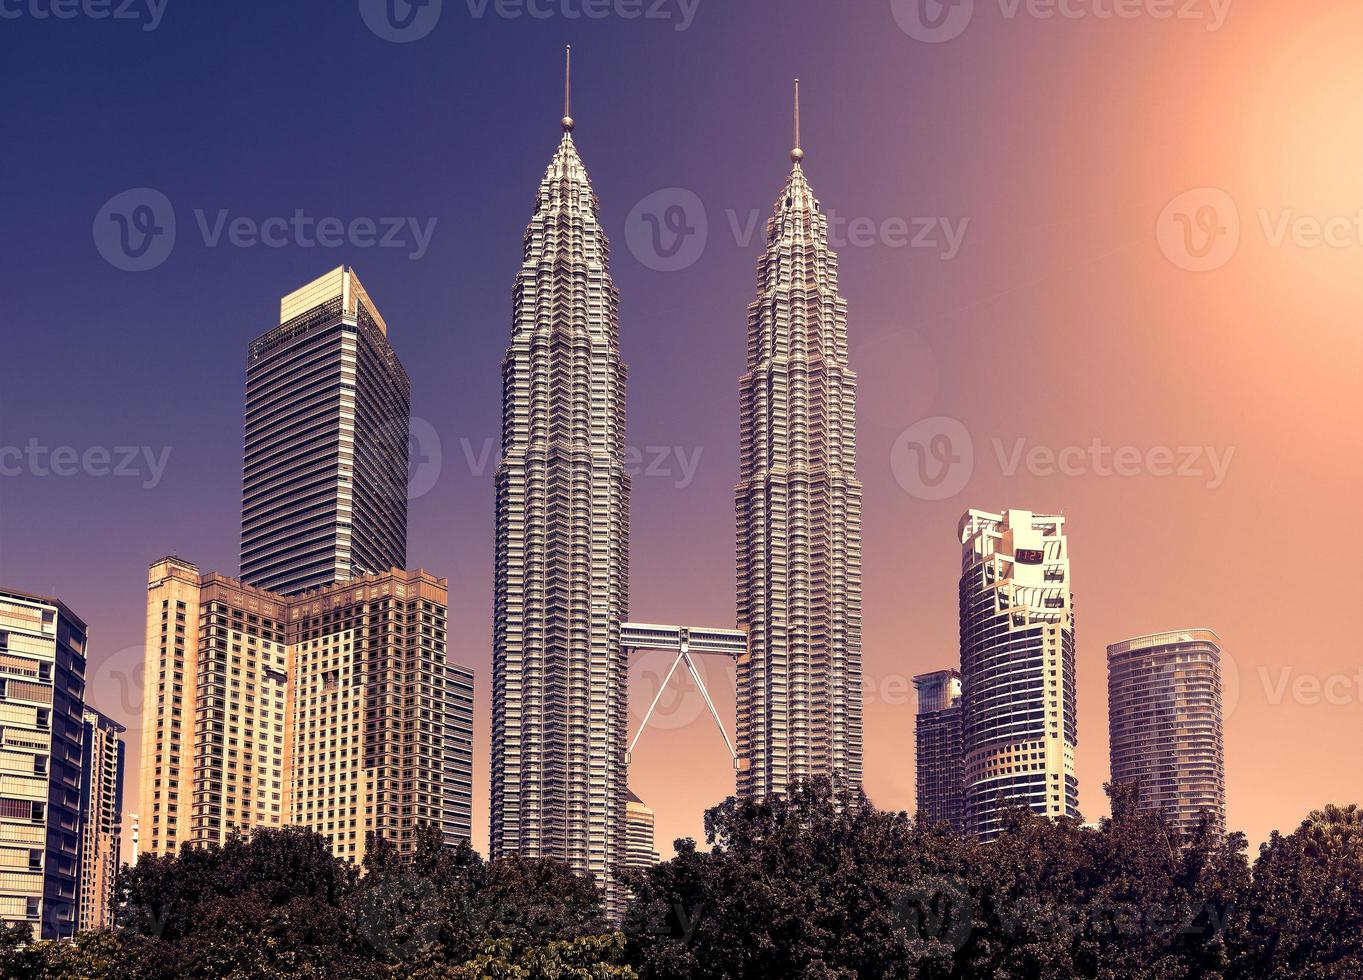 Skyline aux tons vintage de Kuala Lumpur, Malaisie. photo